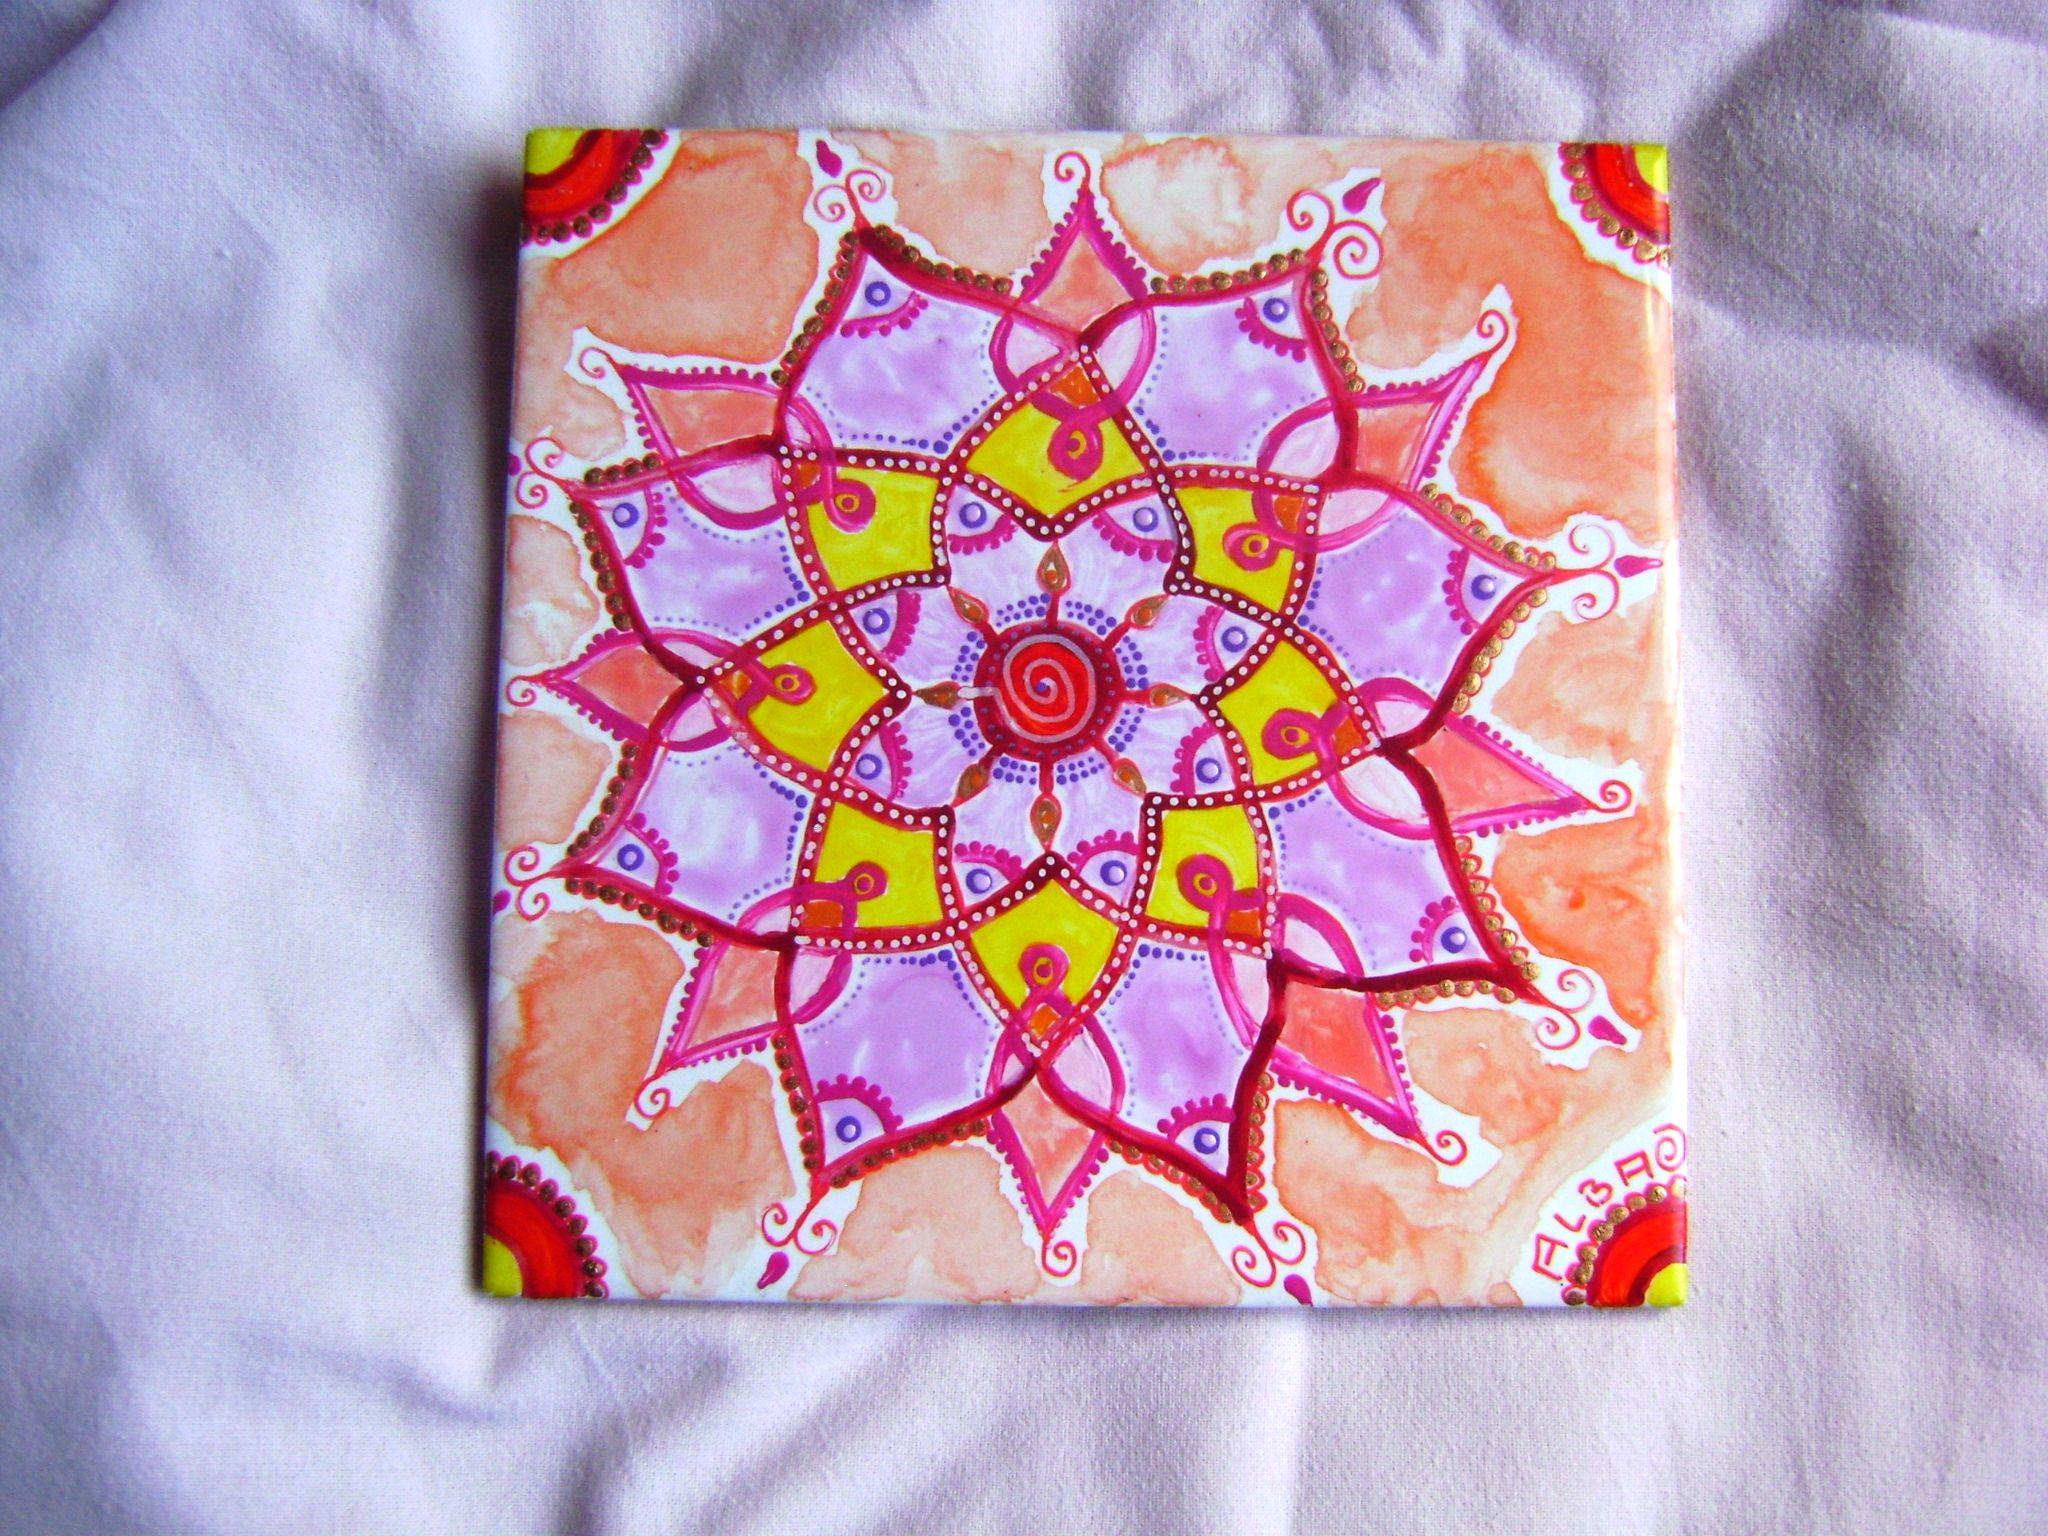 Pittura Su Piastrelle Di Ceramica : Mandala su piastrella piastrelle dipinte a mano